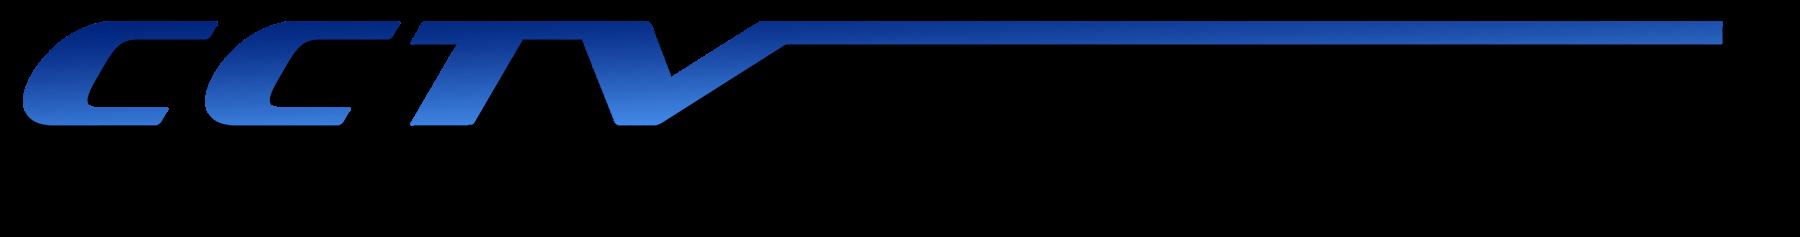 logo-cctvsp-03042017.png